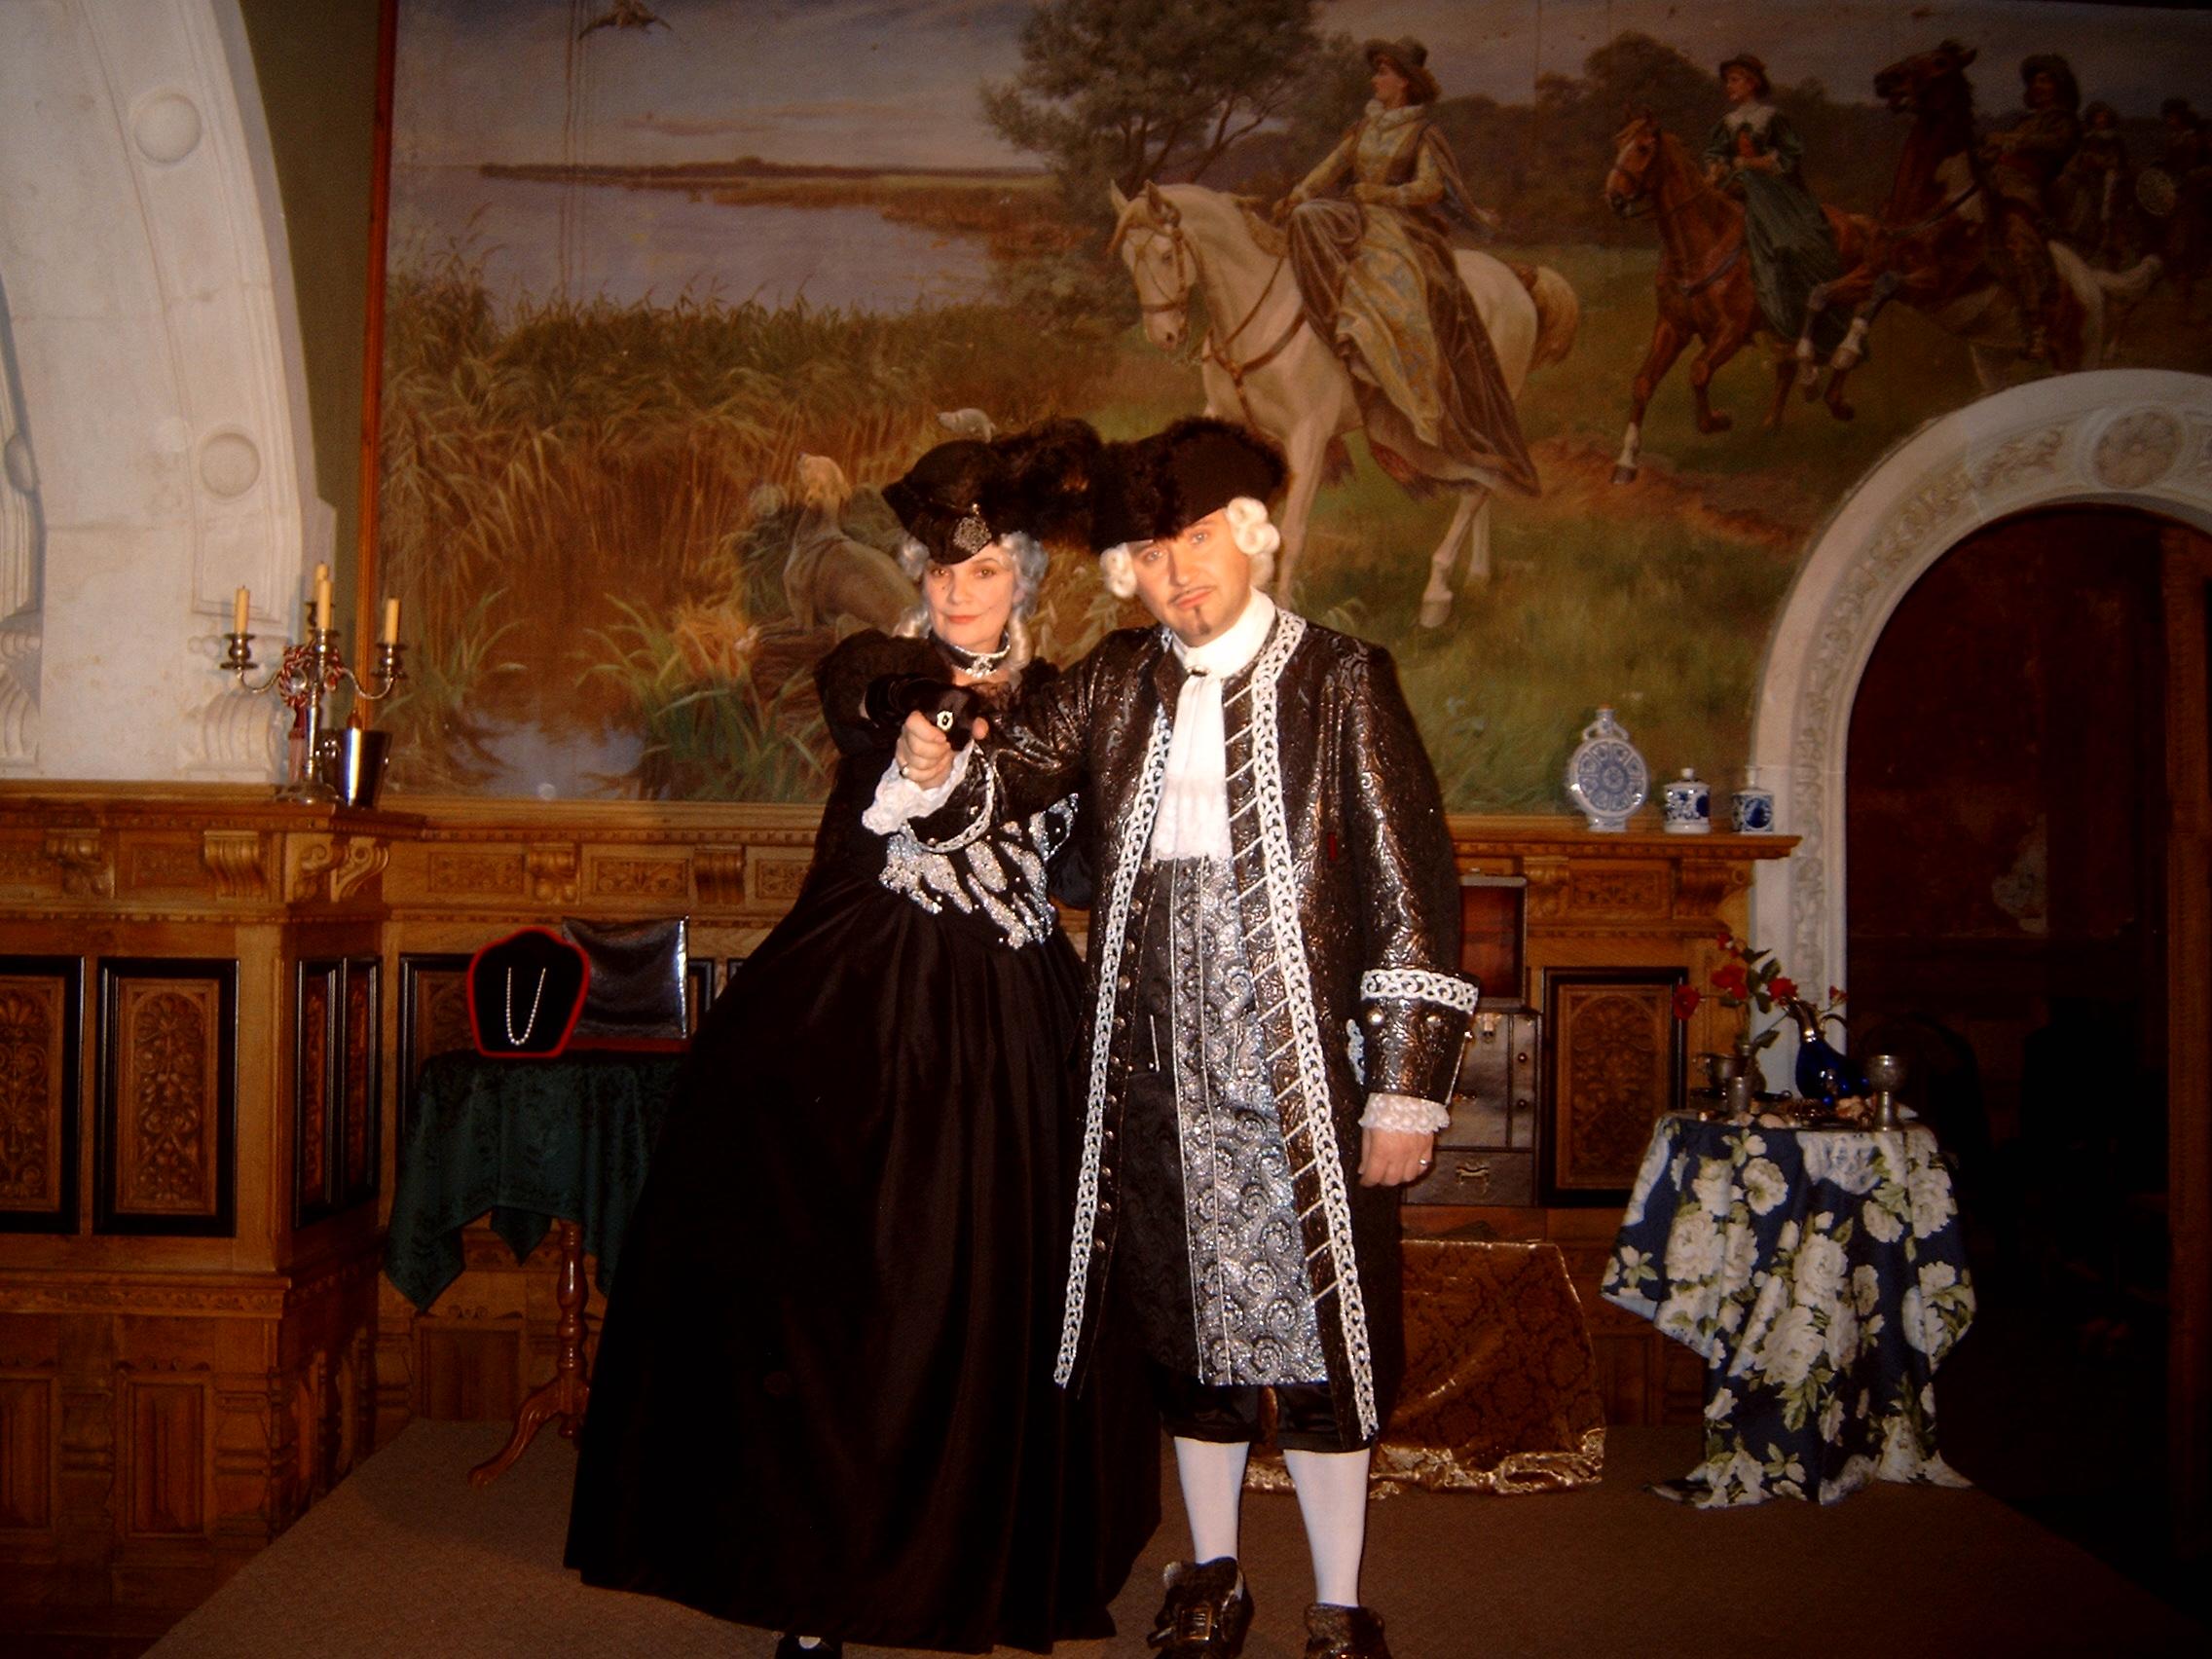 Mystik-Barock mit Gräfin Cosel